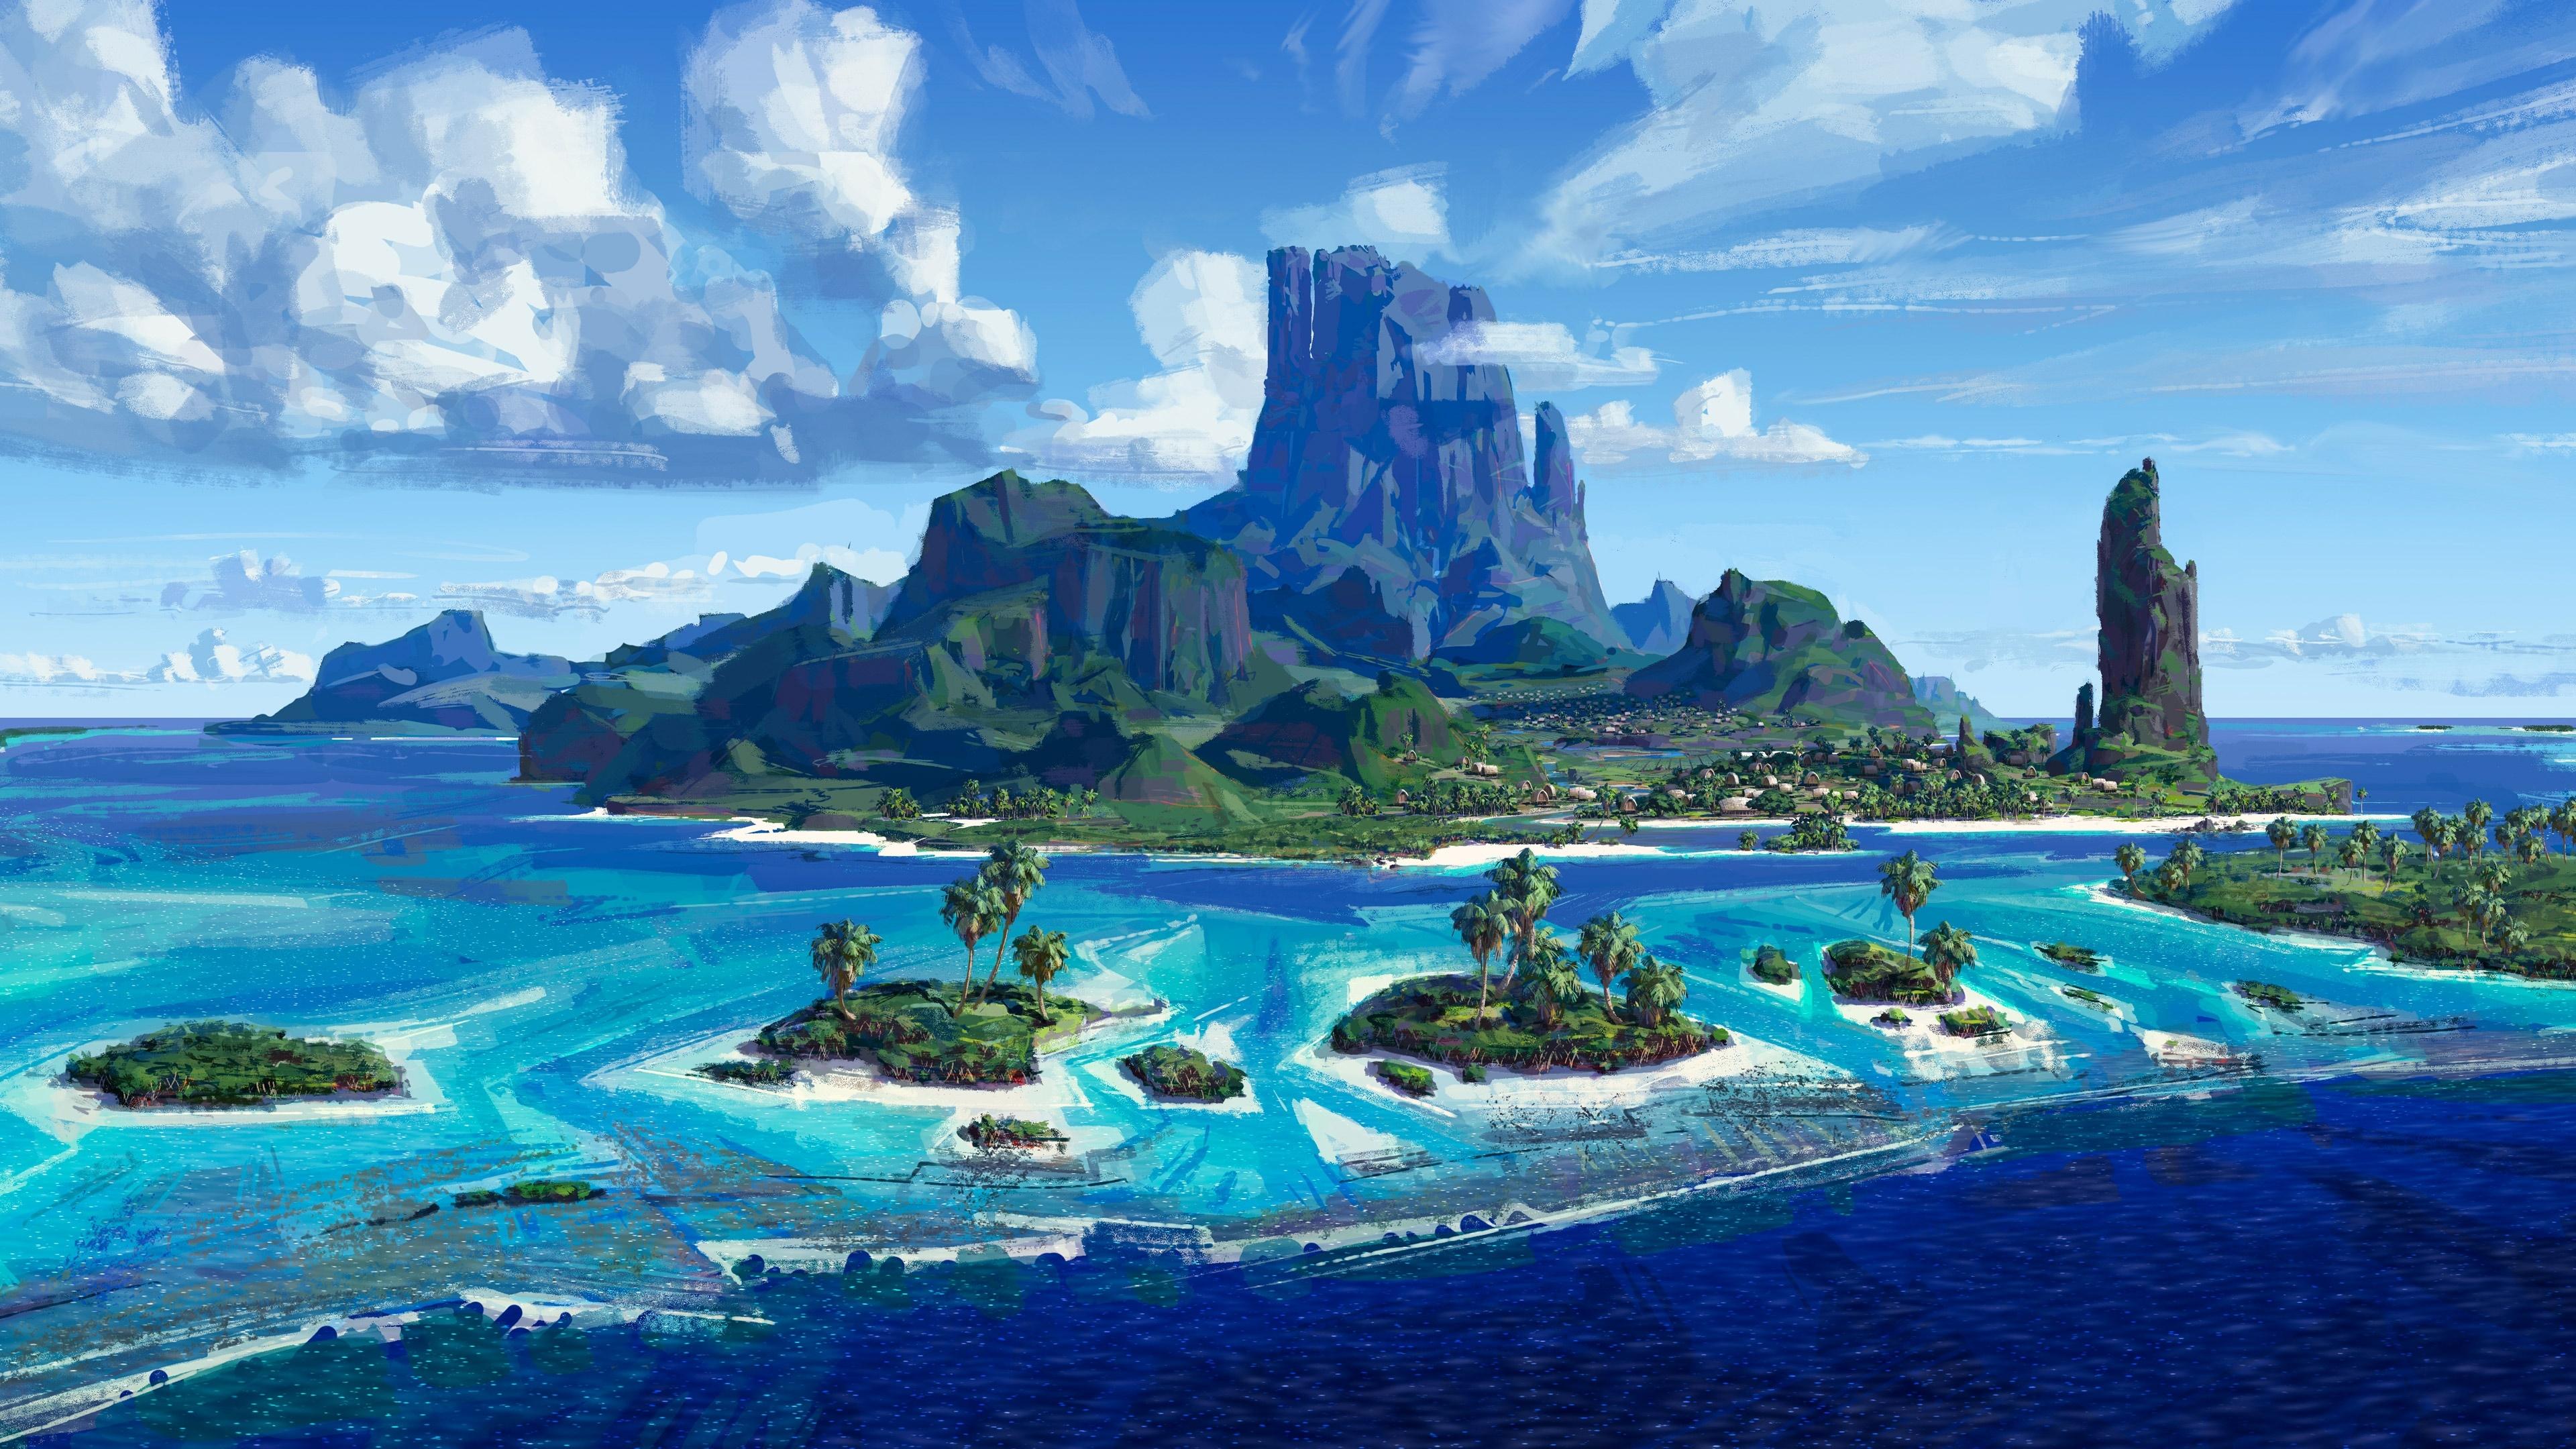 Tropical landscape - Fantasy art wallpaper